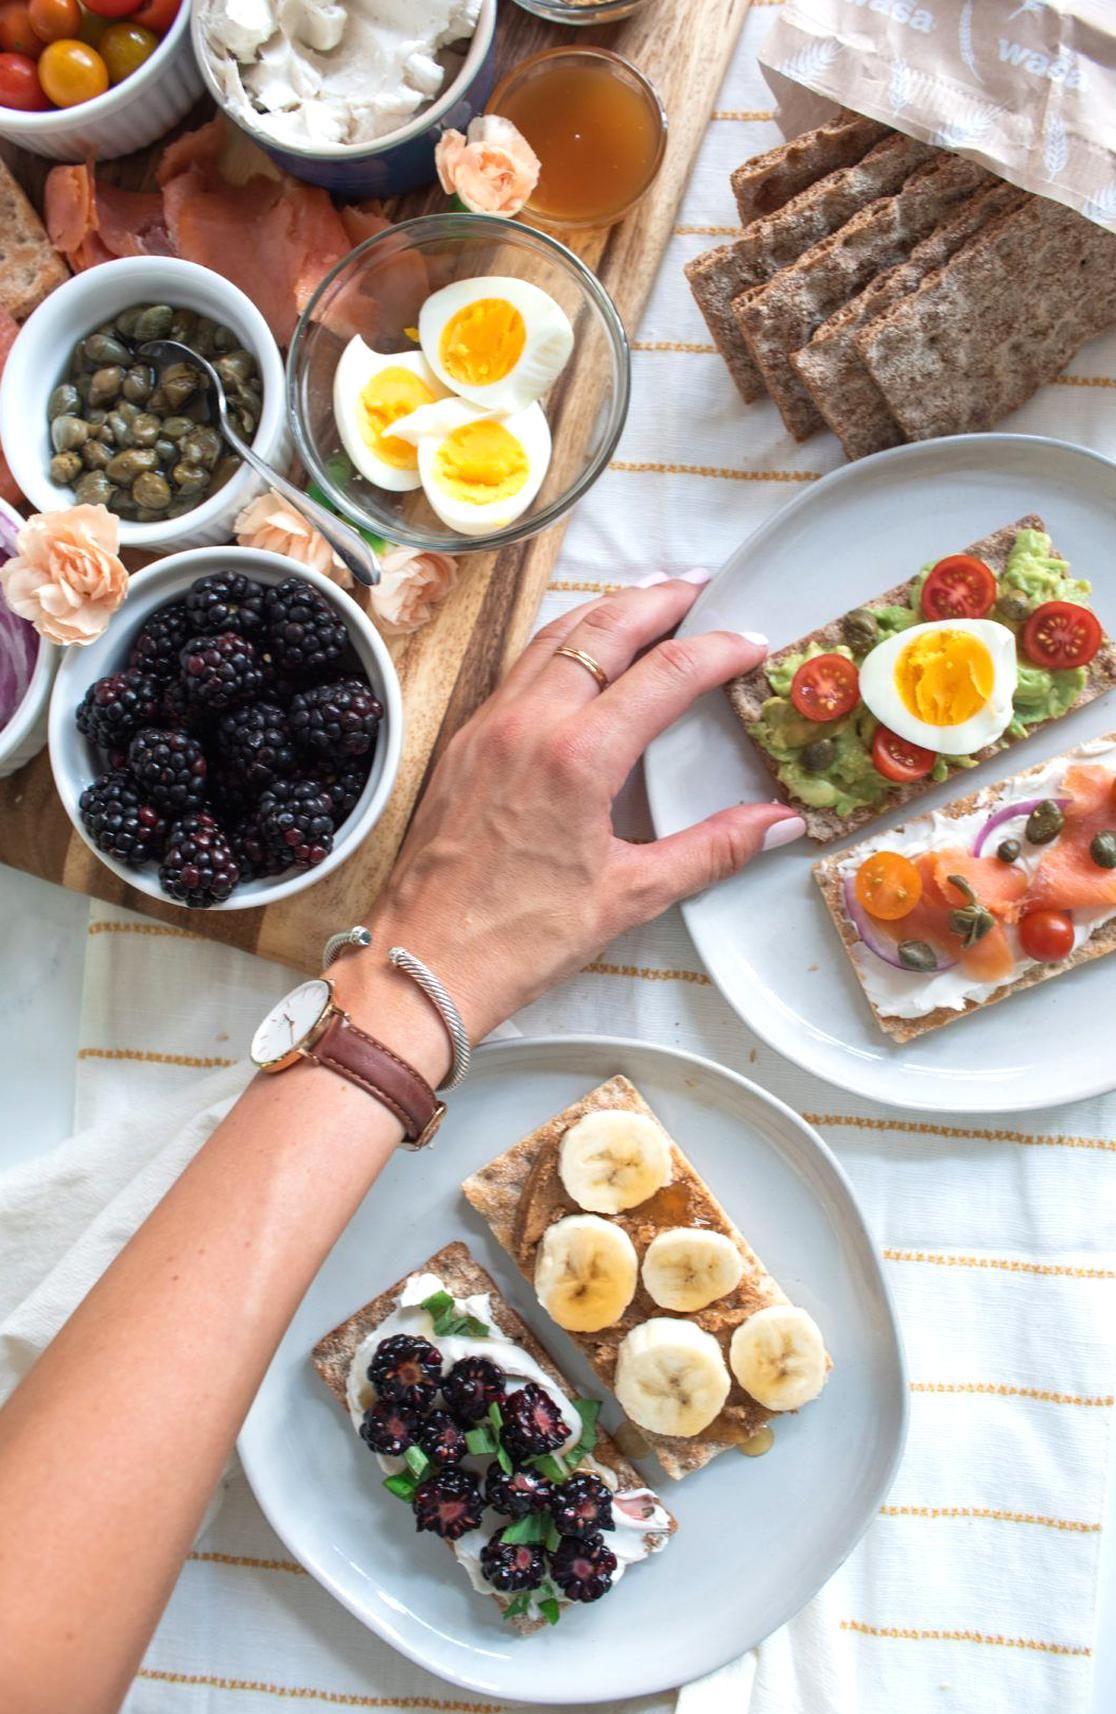 How To Make A Brunch Buffet Board In 2020 Health Food Breakfast Healthy Lifestyle Food Breakfast Picnic